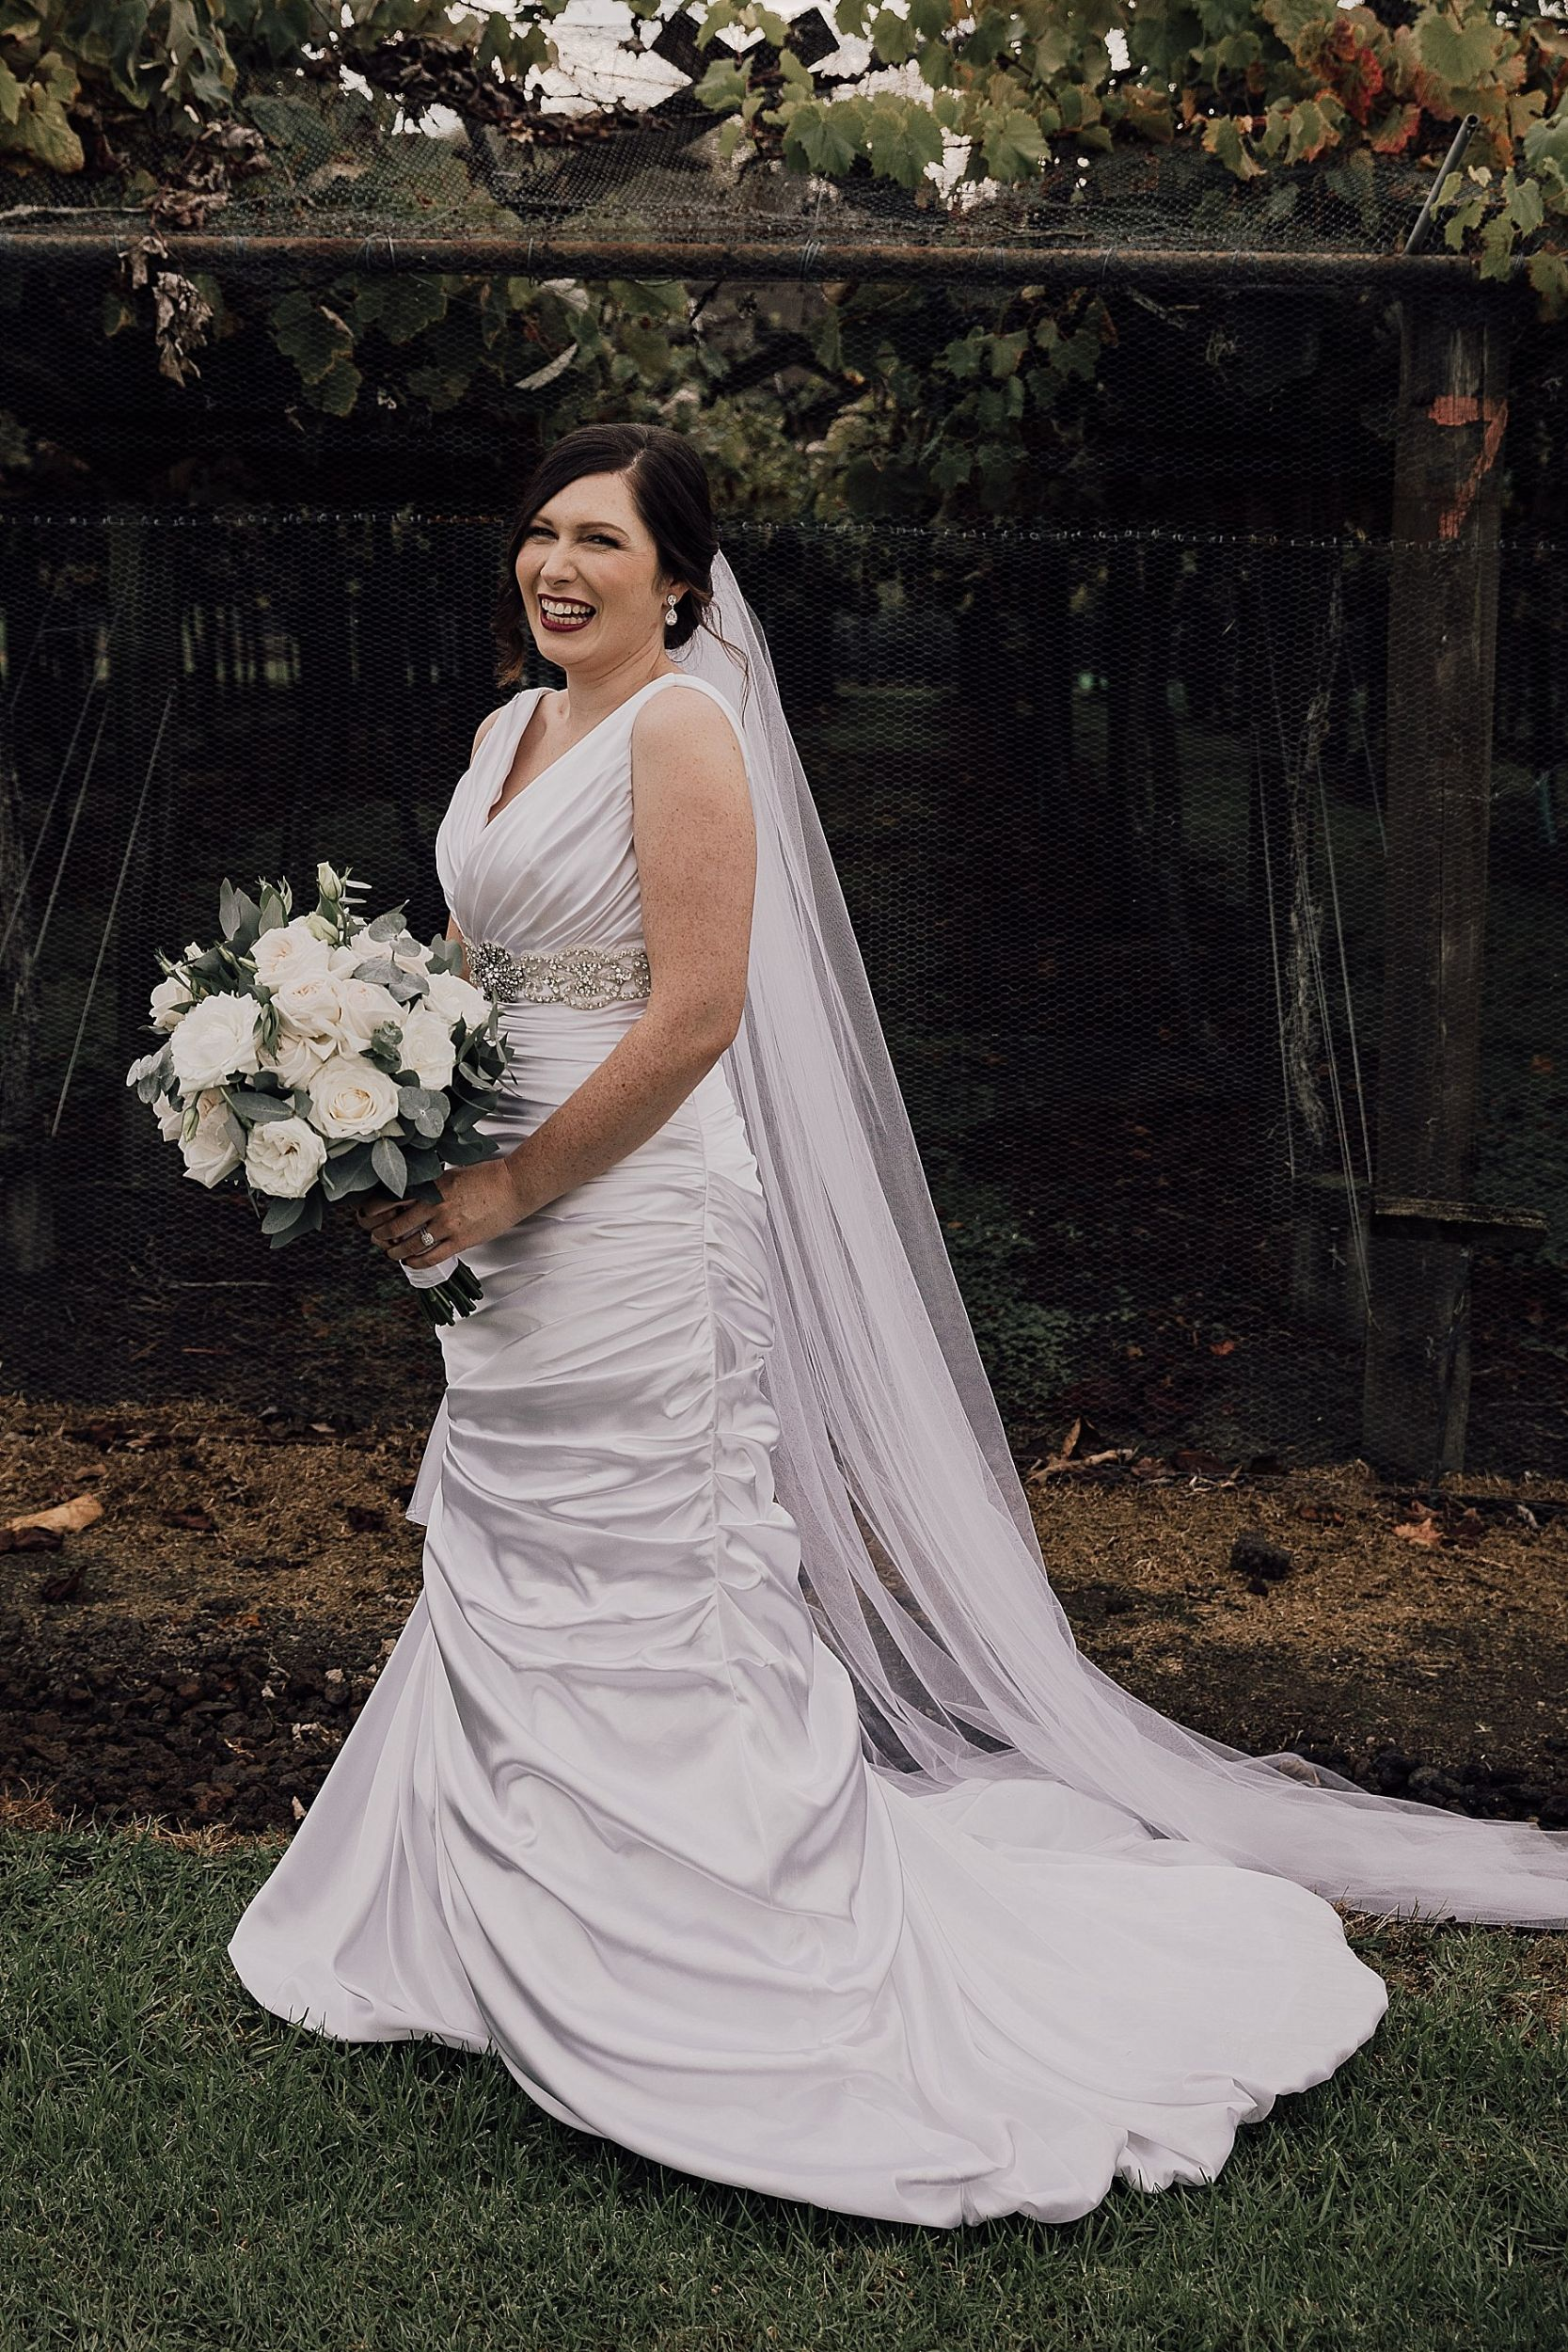 Allely Estate Wedding Auckland Wedding Photographer - Jana & Laurie_0177.jpg